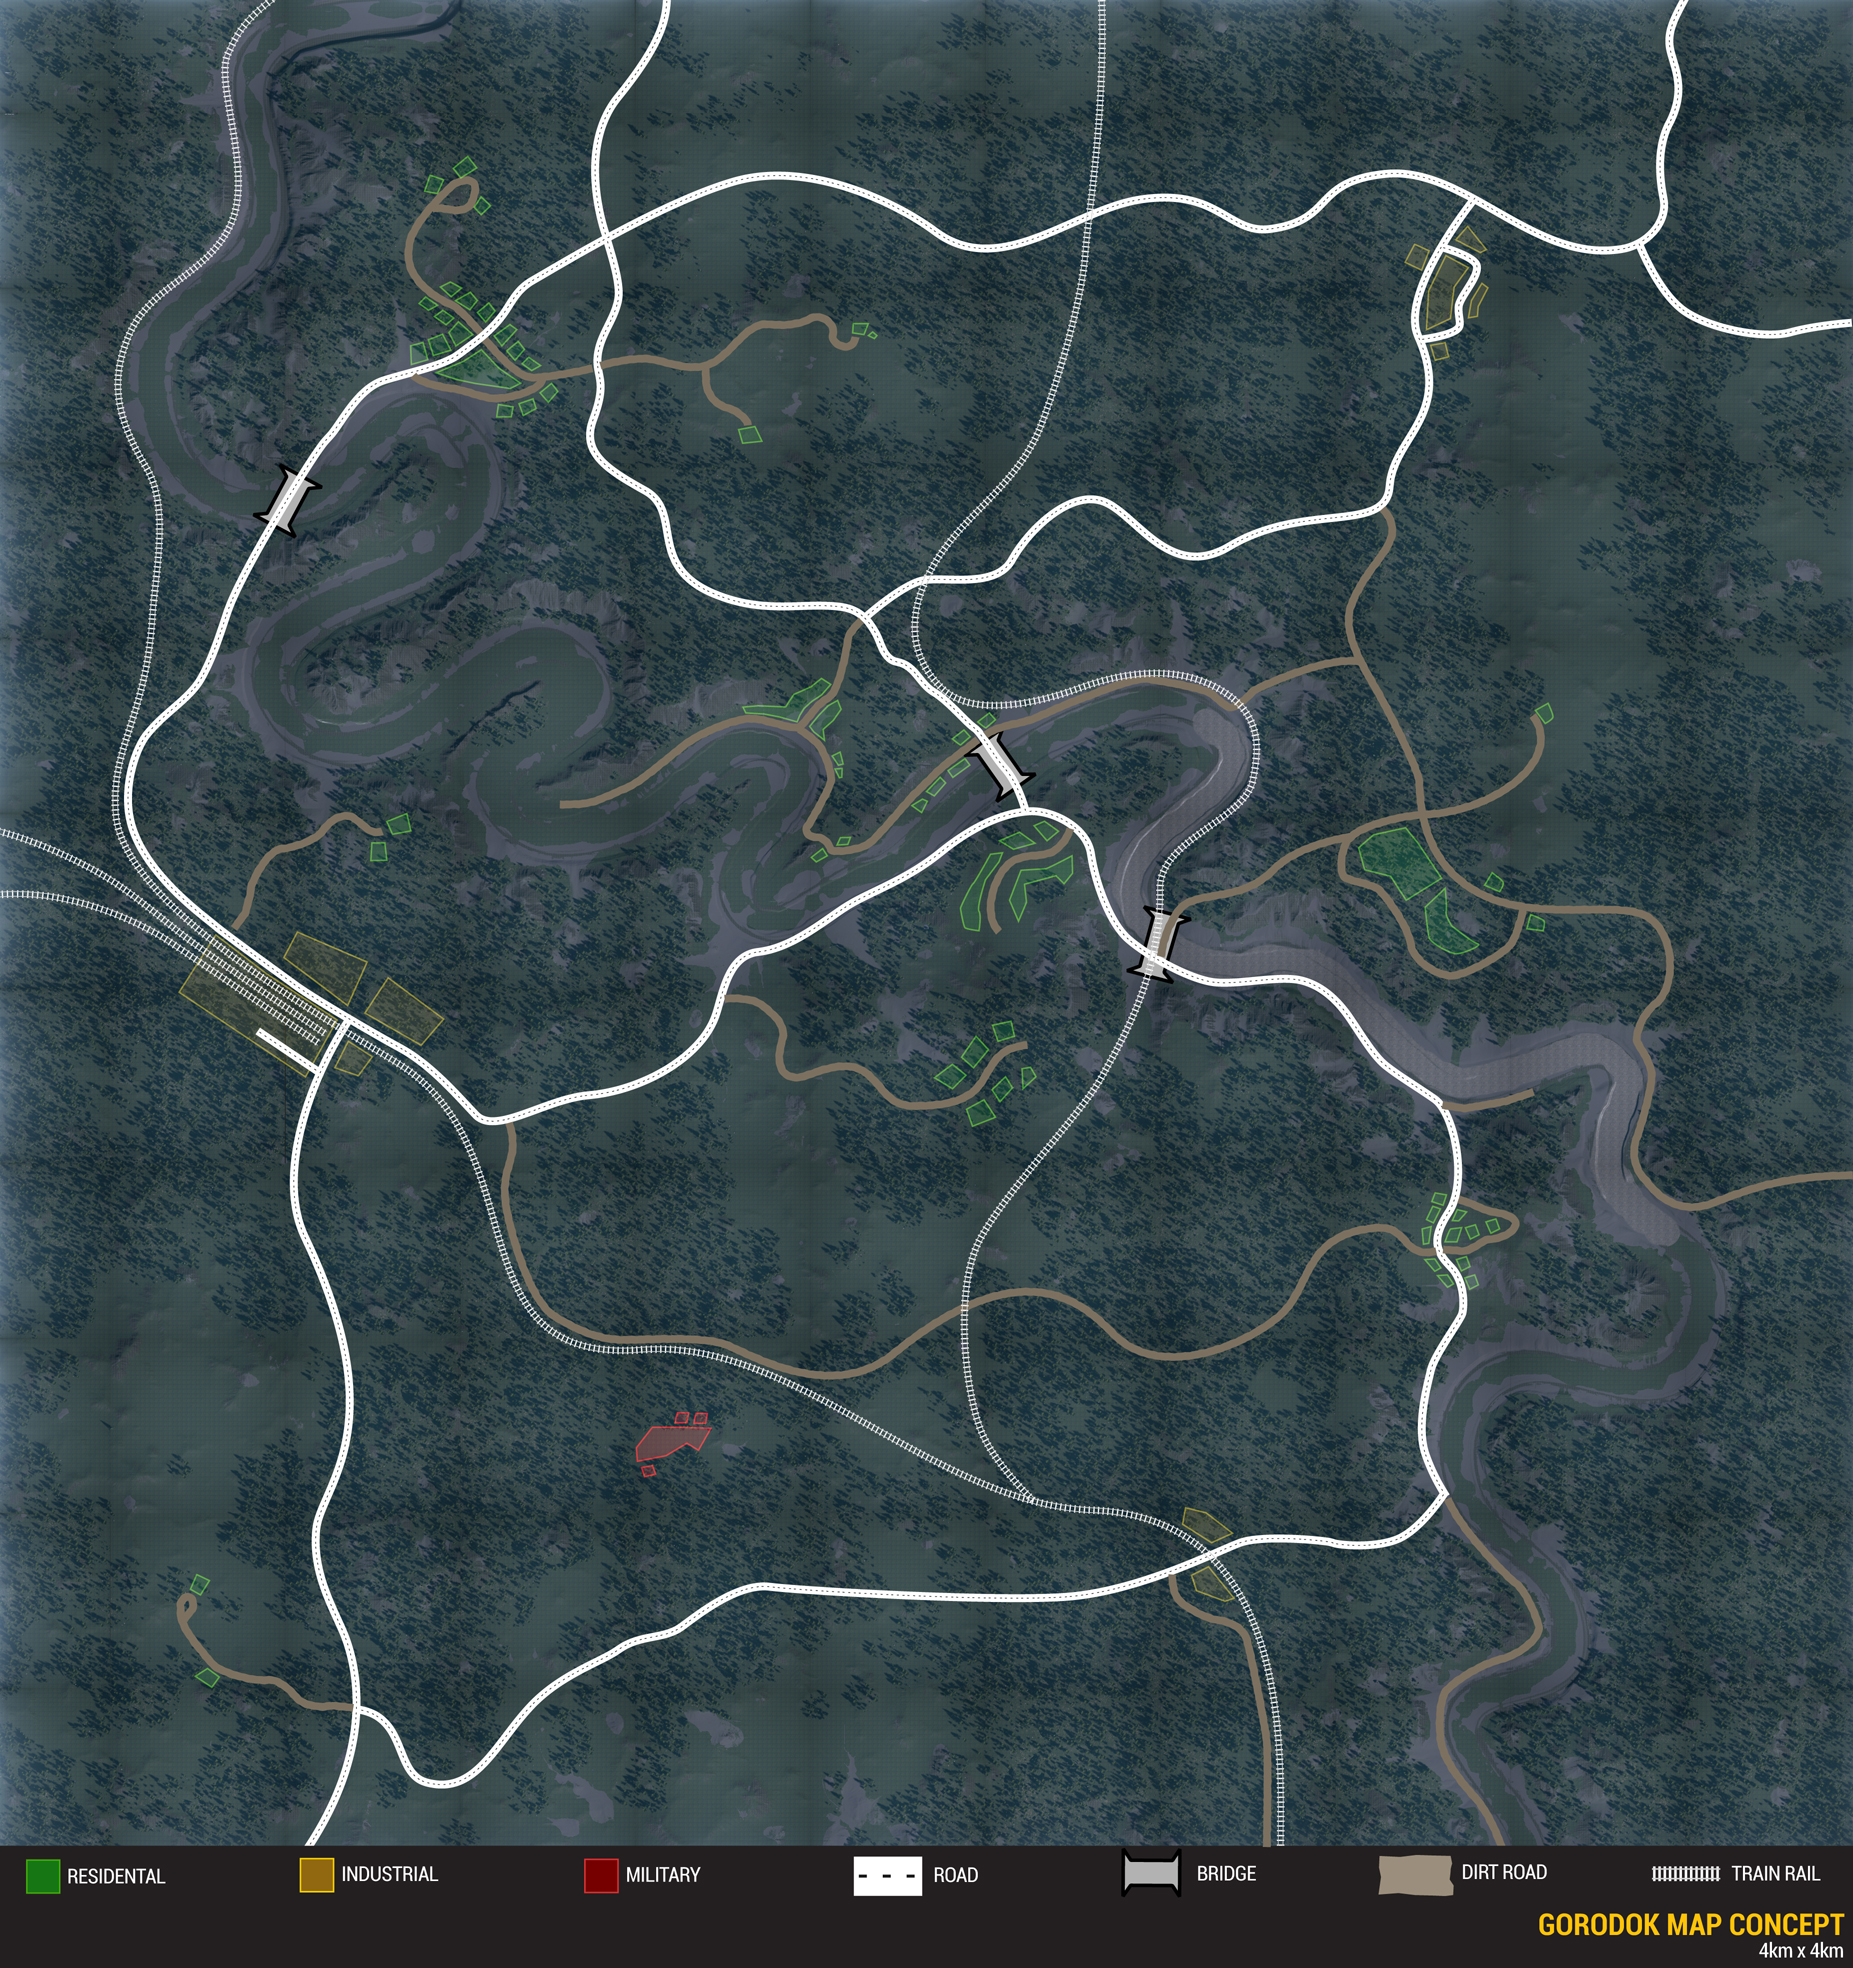 Gorodok_map_concept.jpg